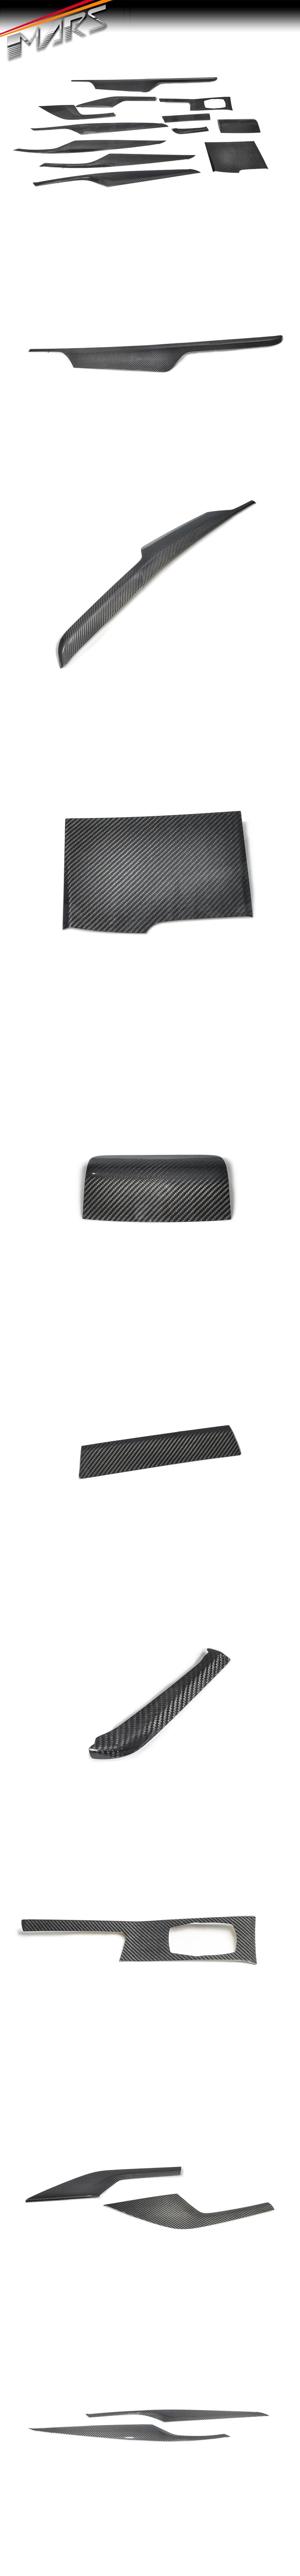 Real Carbon Fibre RHD Interior Dash Trim & Door Handle Covers for